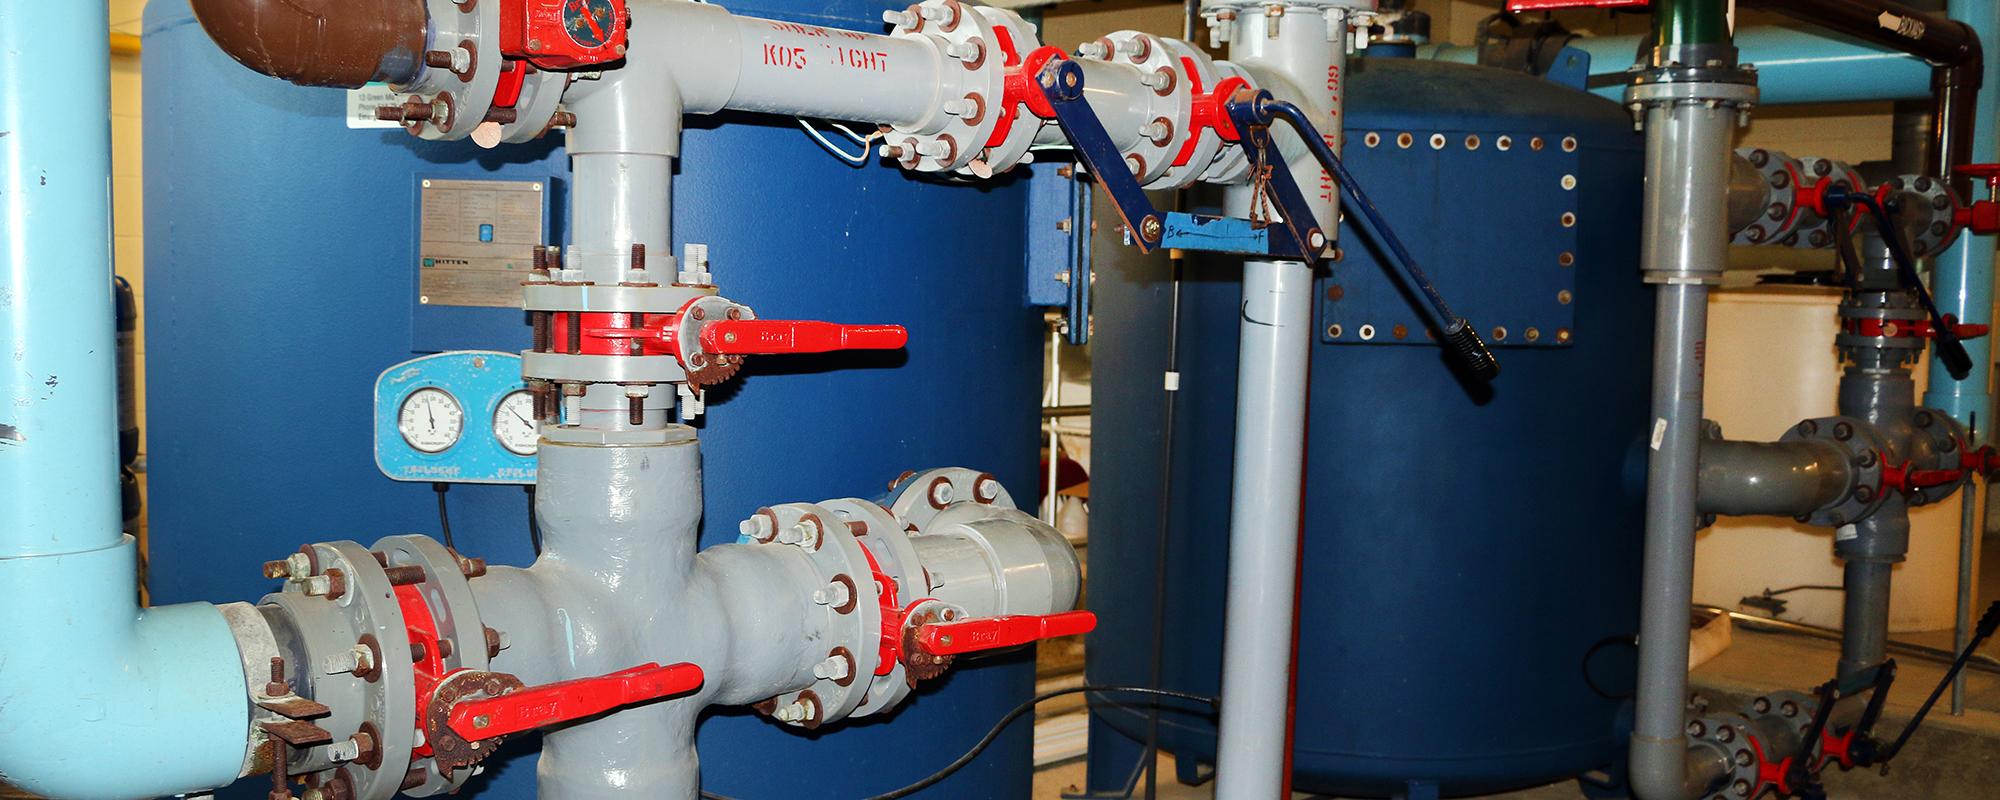 A blue filtration system